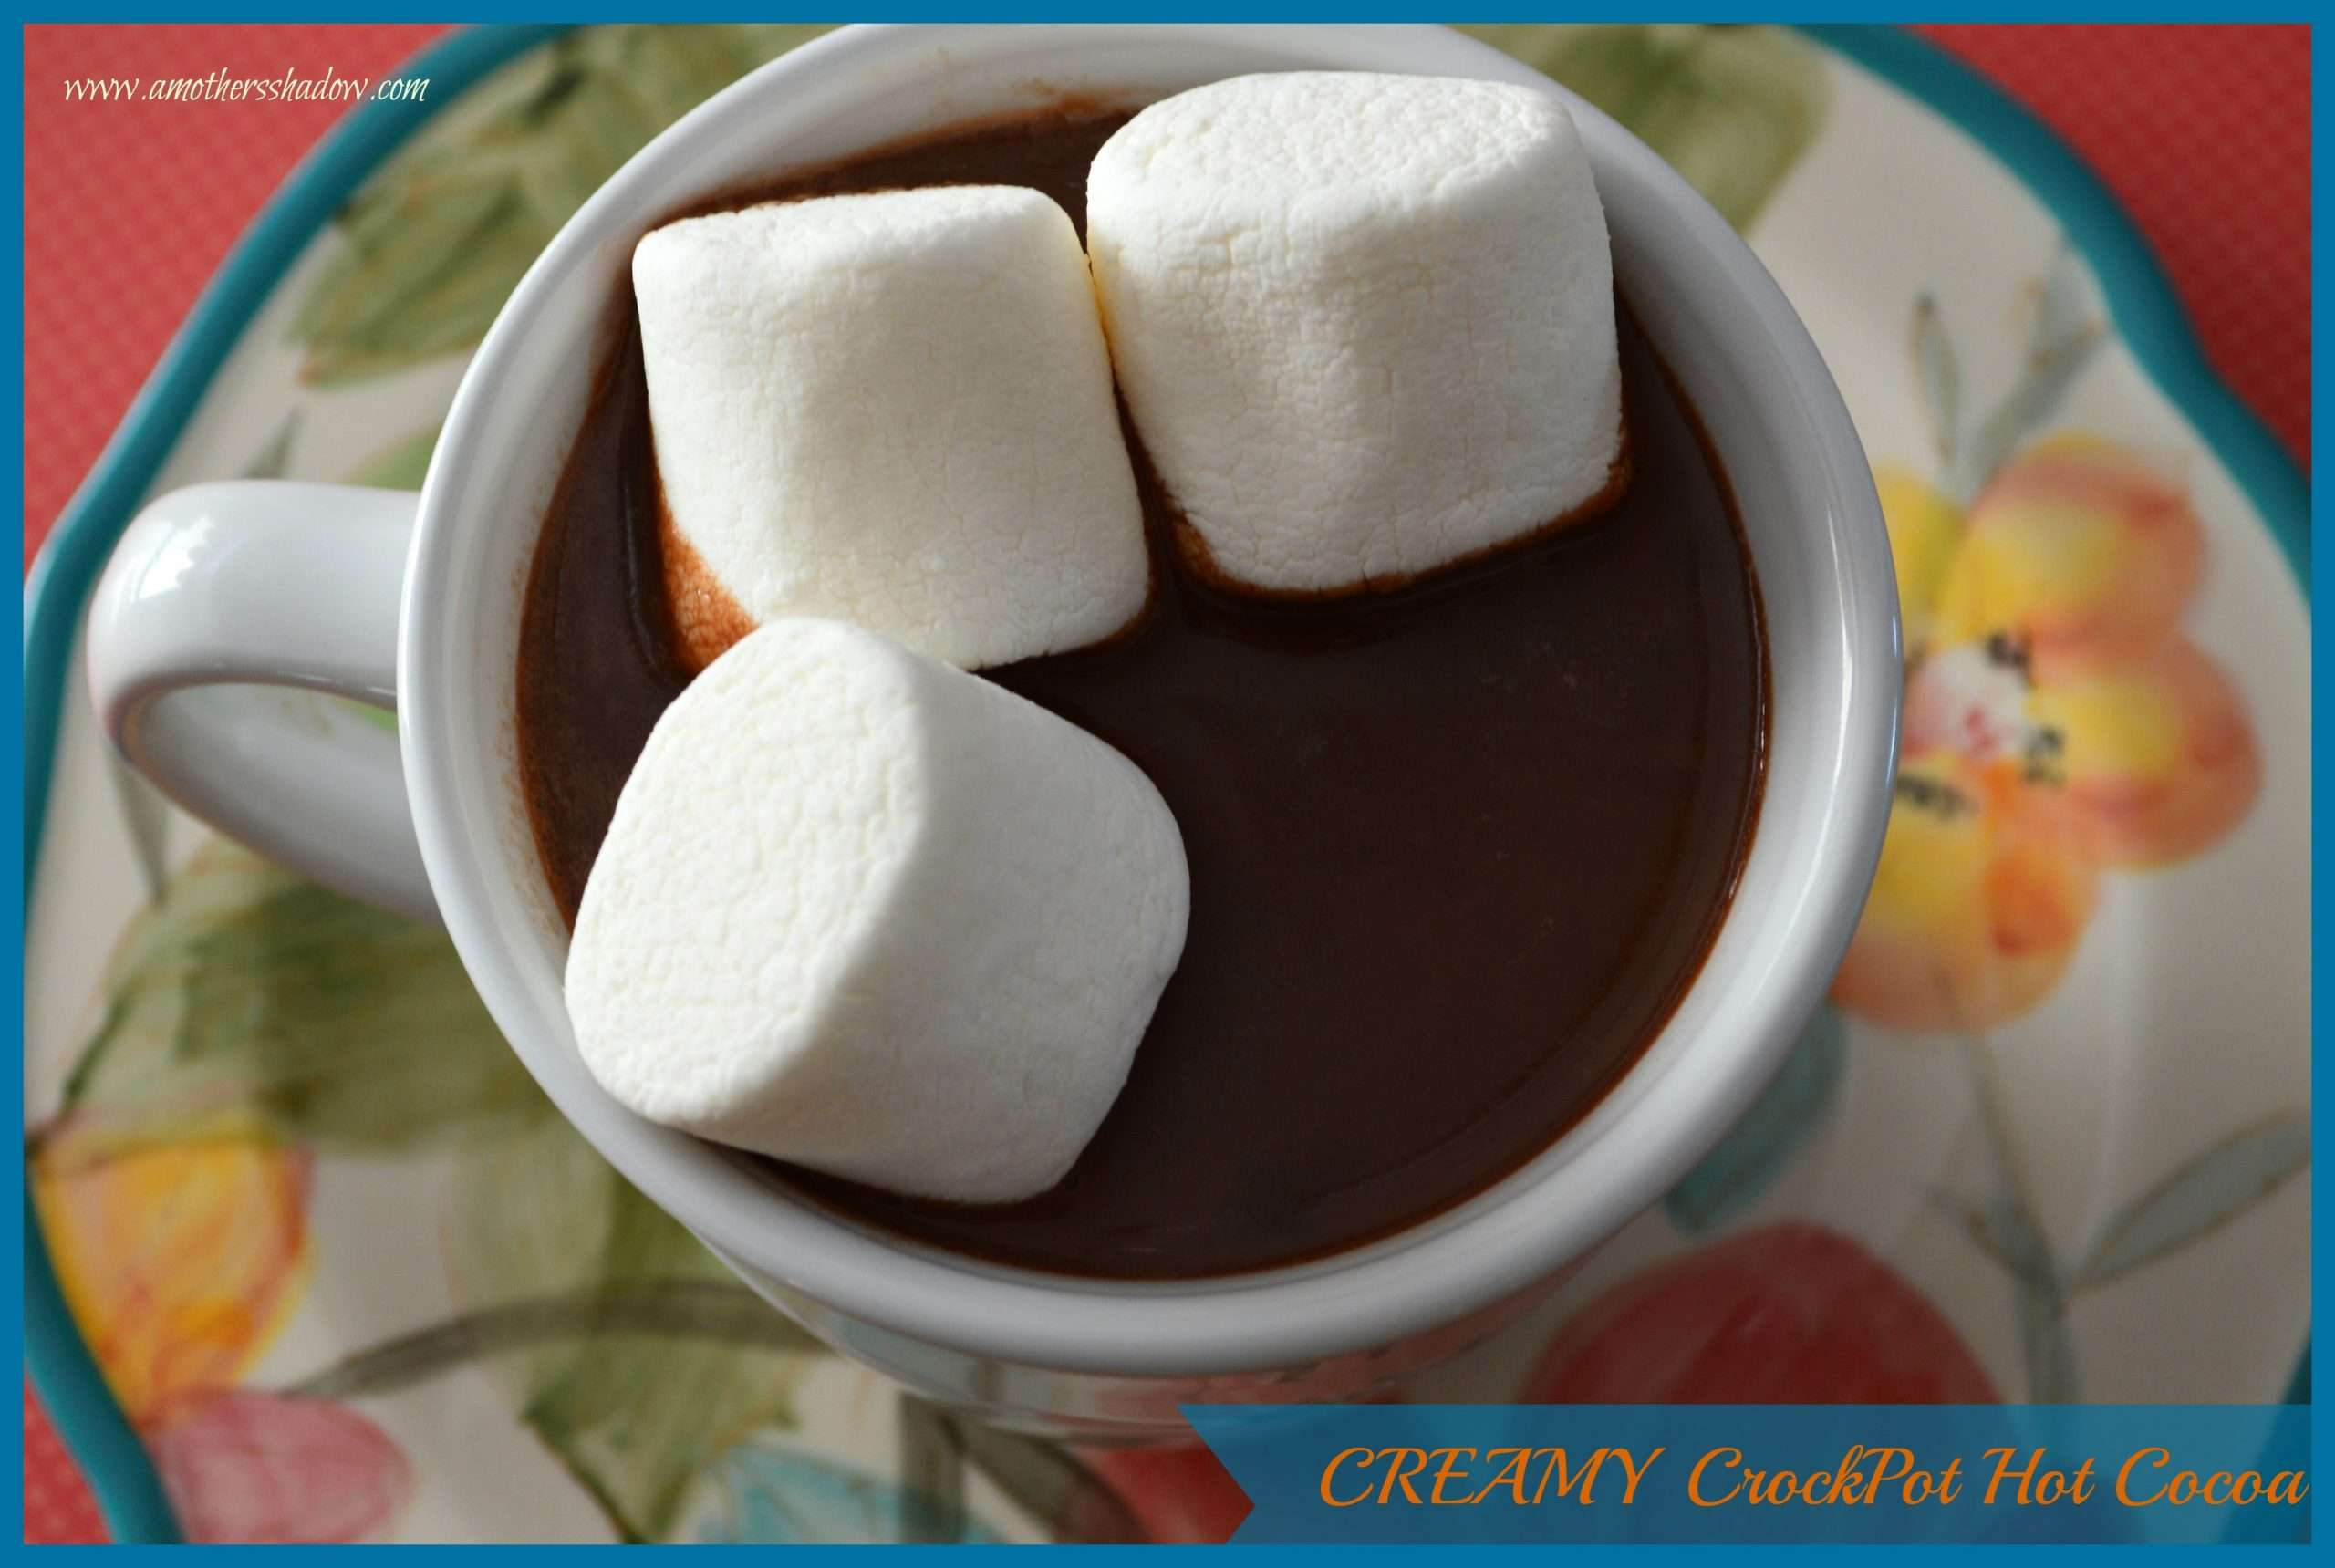 Best Creamy Crock Pot Hot Cocoa